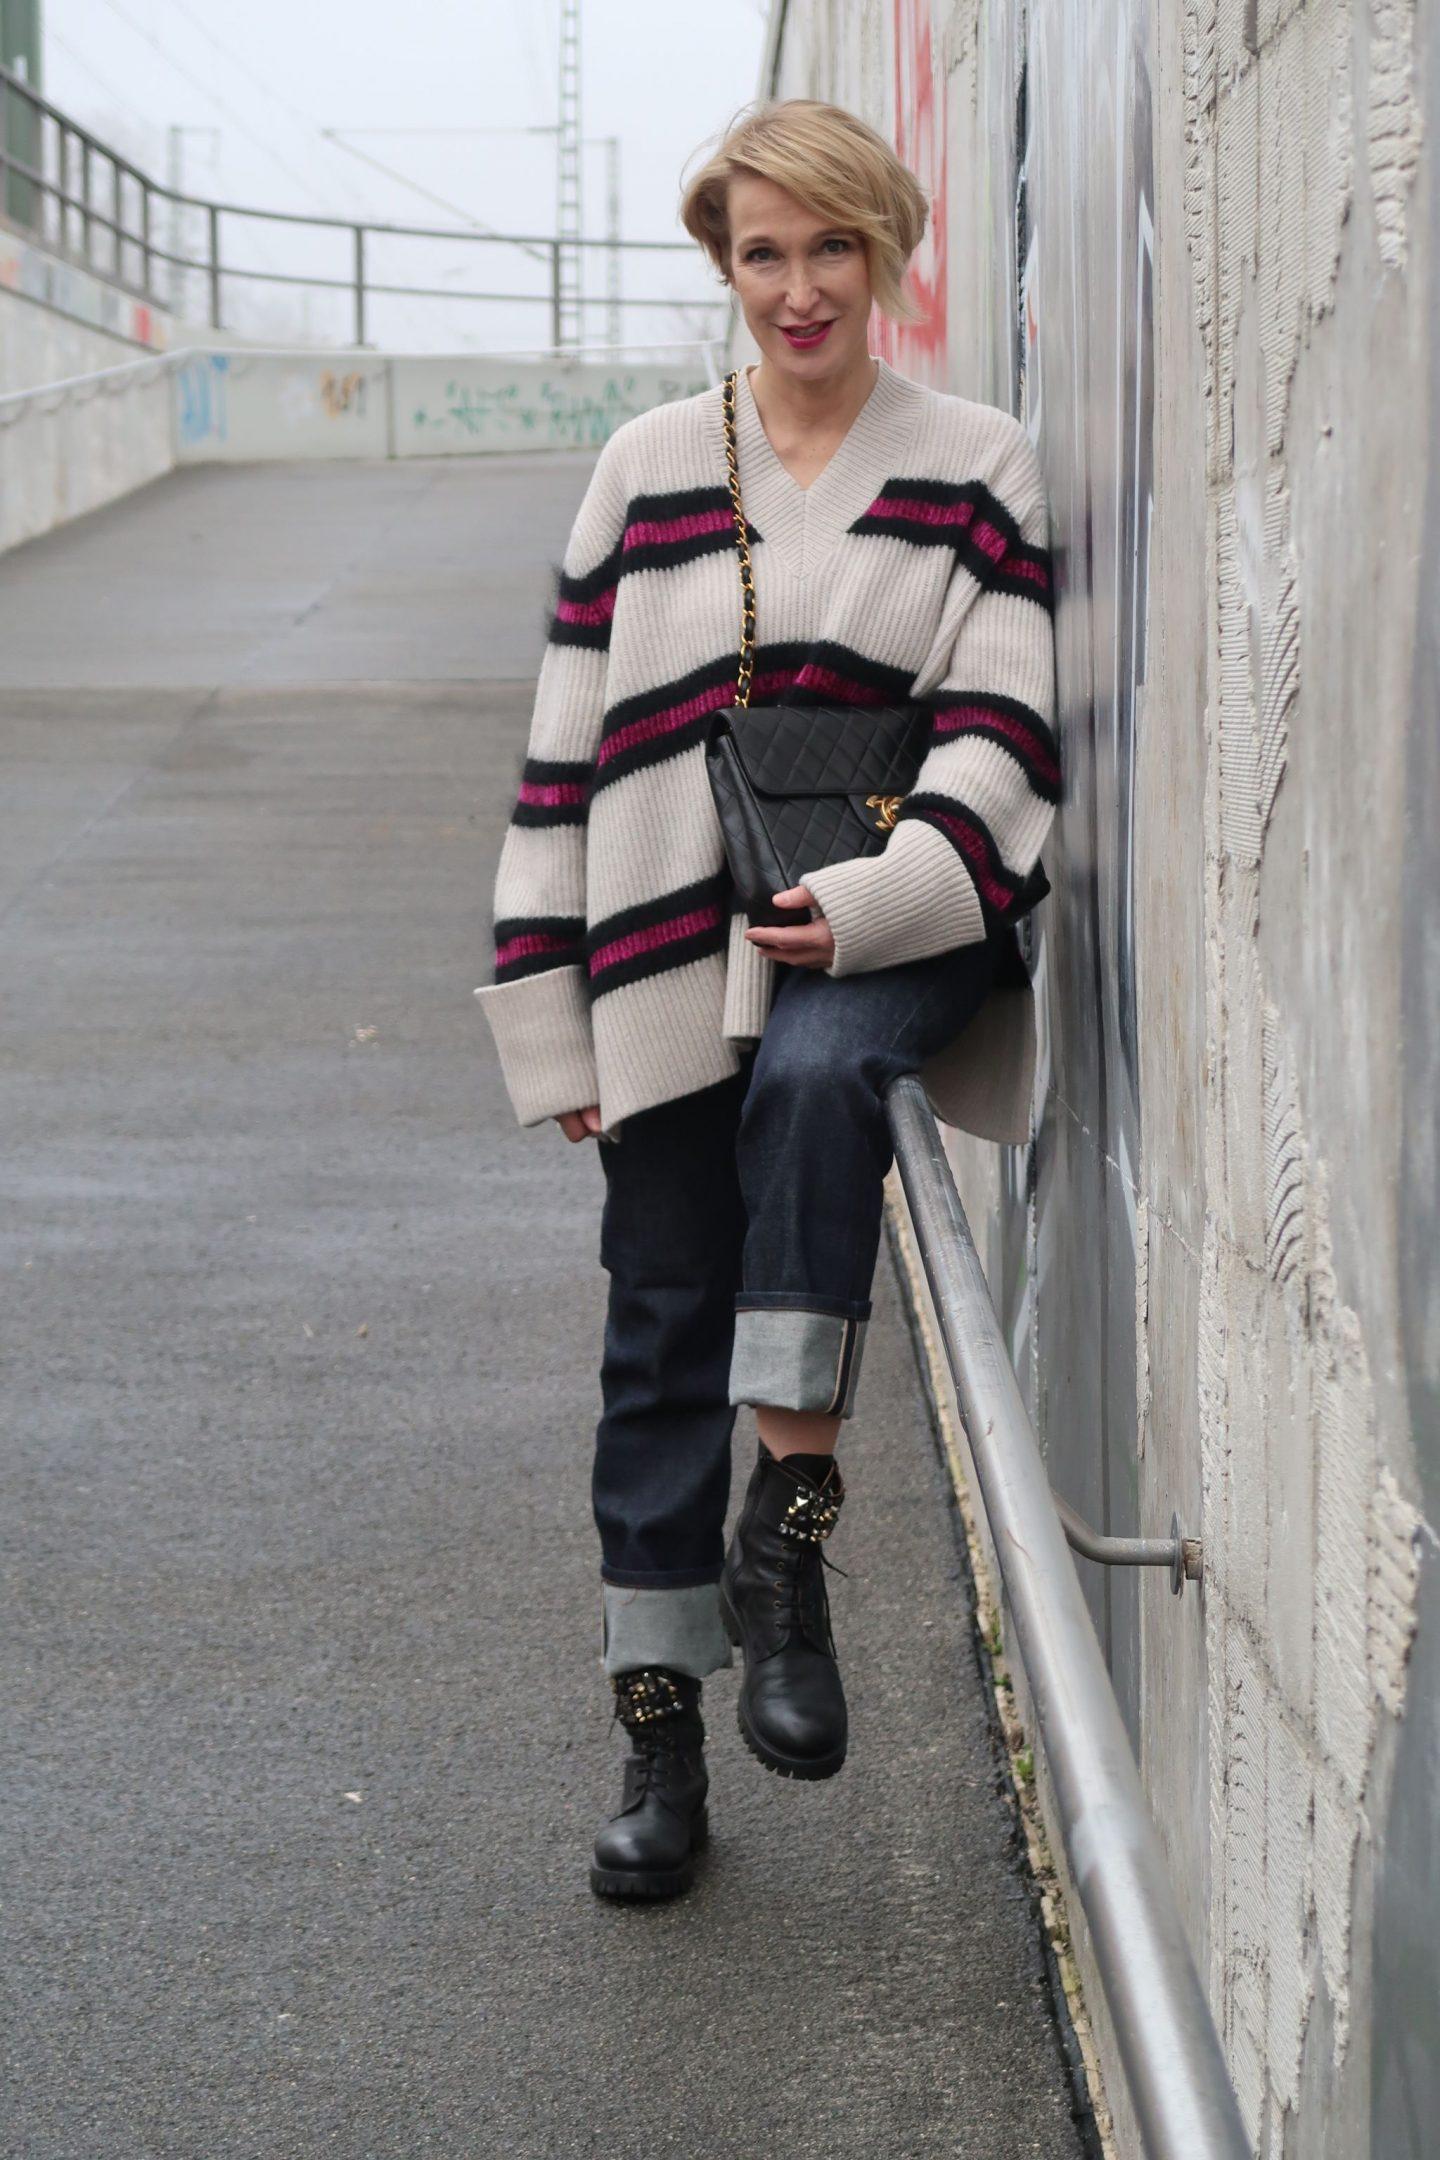 glamupyourlifestyle leo-mantel boyfriend-jeans dicker-pullover chanel-vintage-tasche skinny-jeans